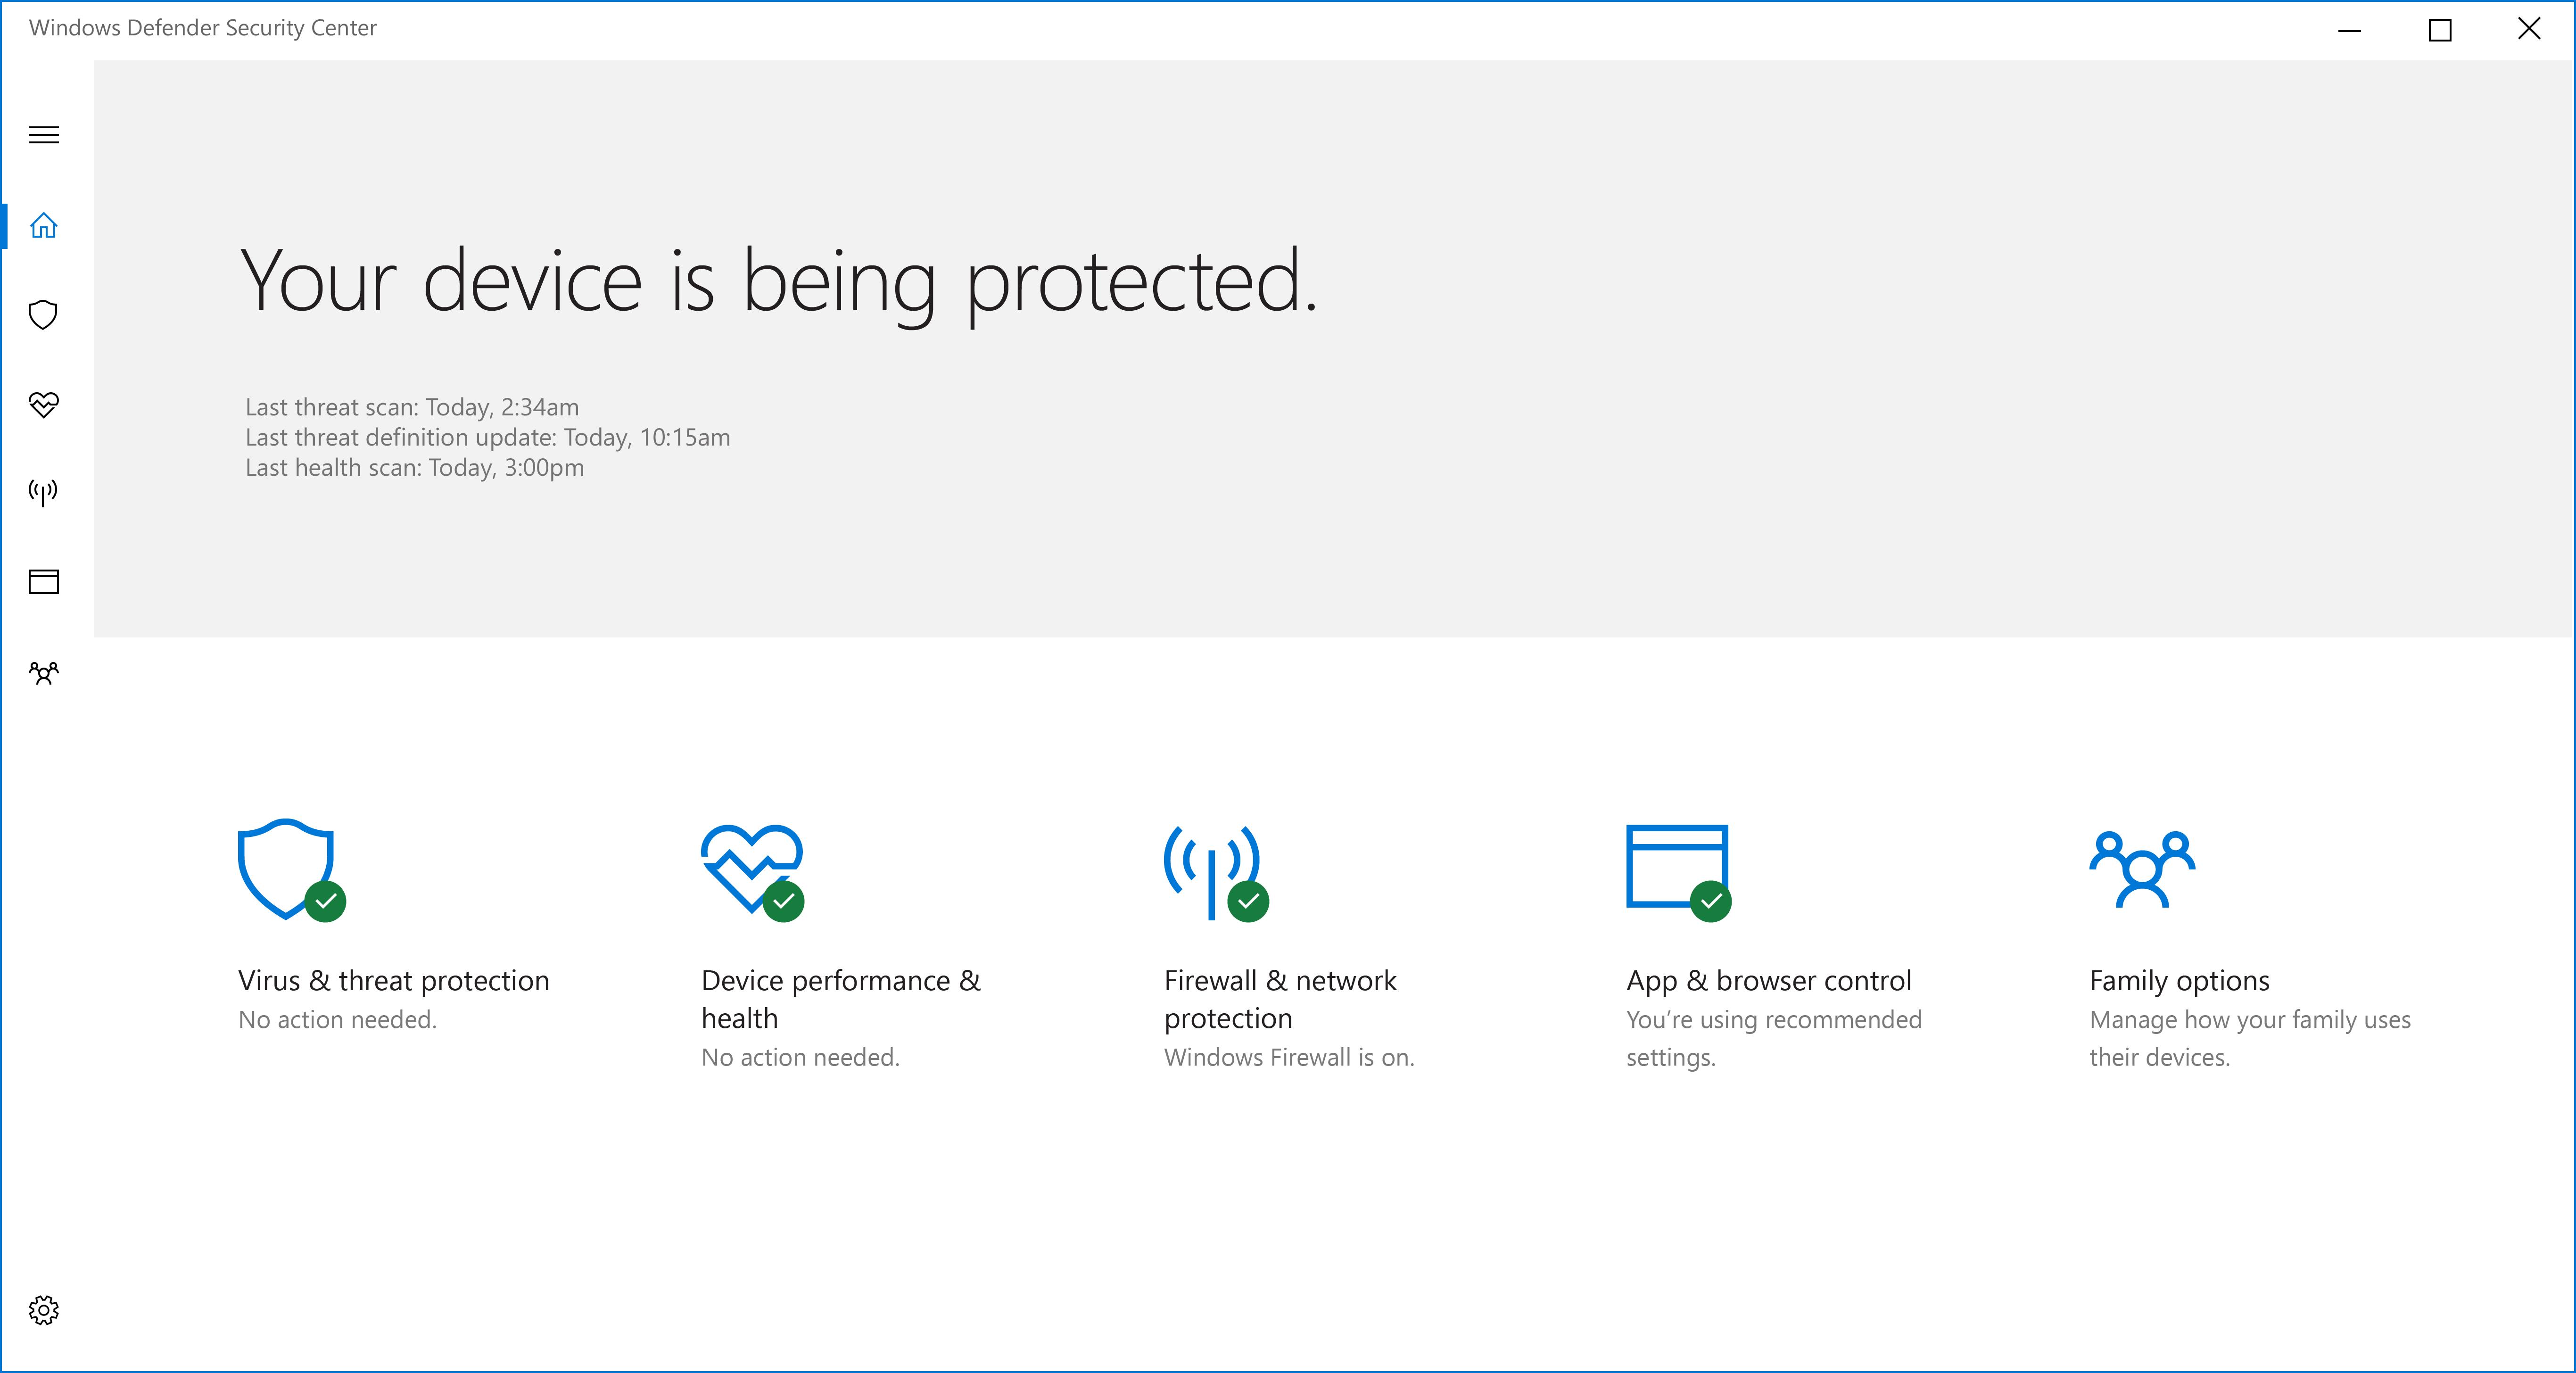 Windows Defender Security Center - Windows 10 for Enterprise